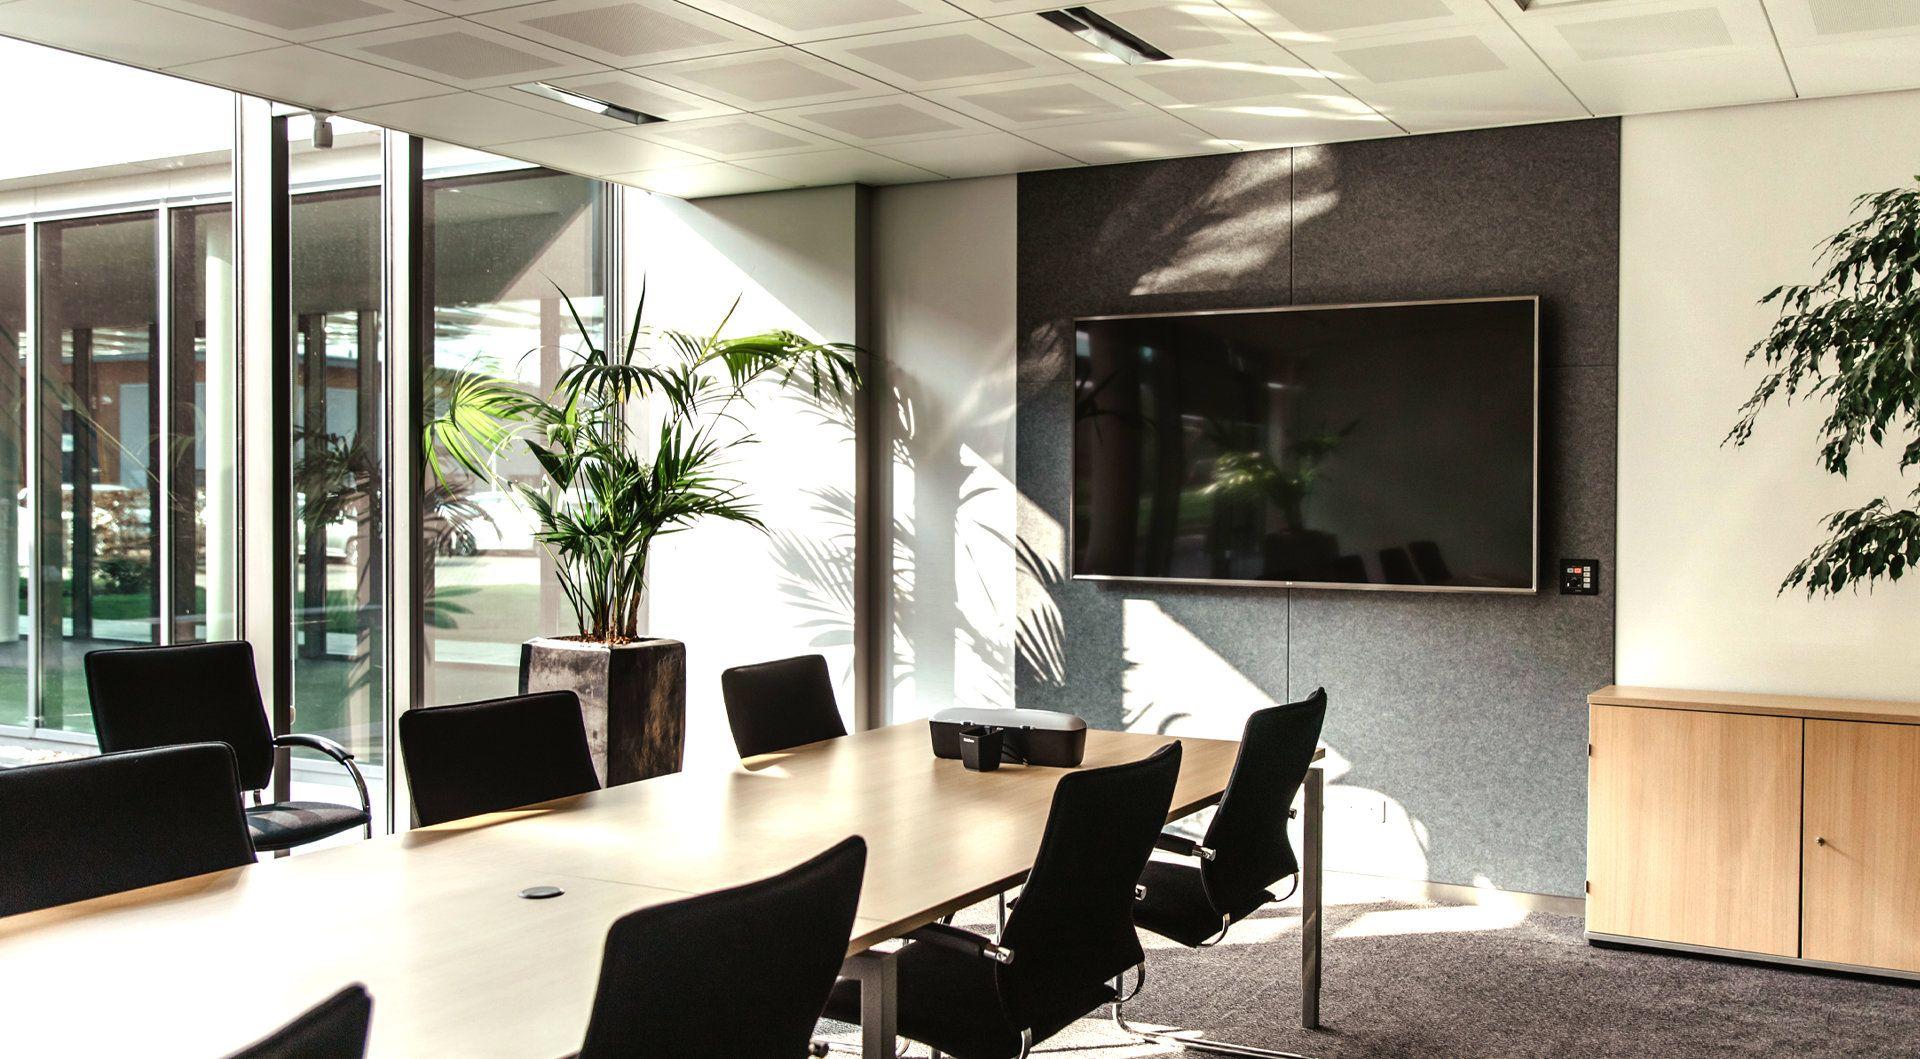 "Conen Mounts SCETTAC flat panel vloer standaard 2,18 m (86"") Draagbare flatscreen vloerstandaard Aluminium, Zwart - Case studie de vries"